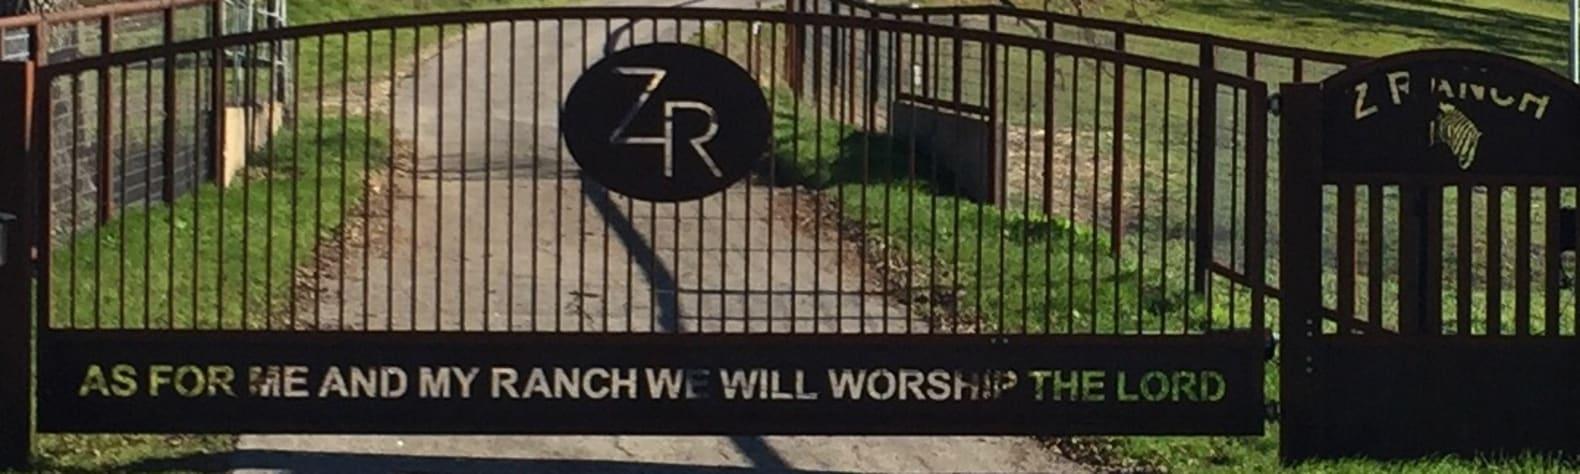 Z Ranch